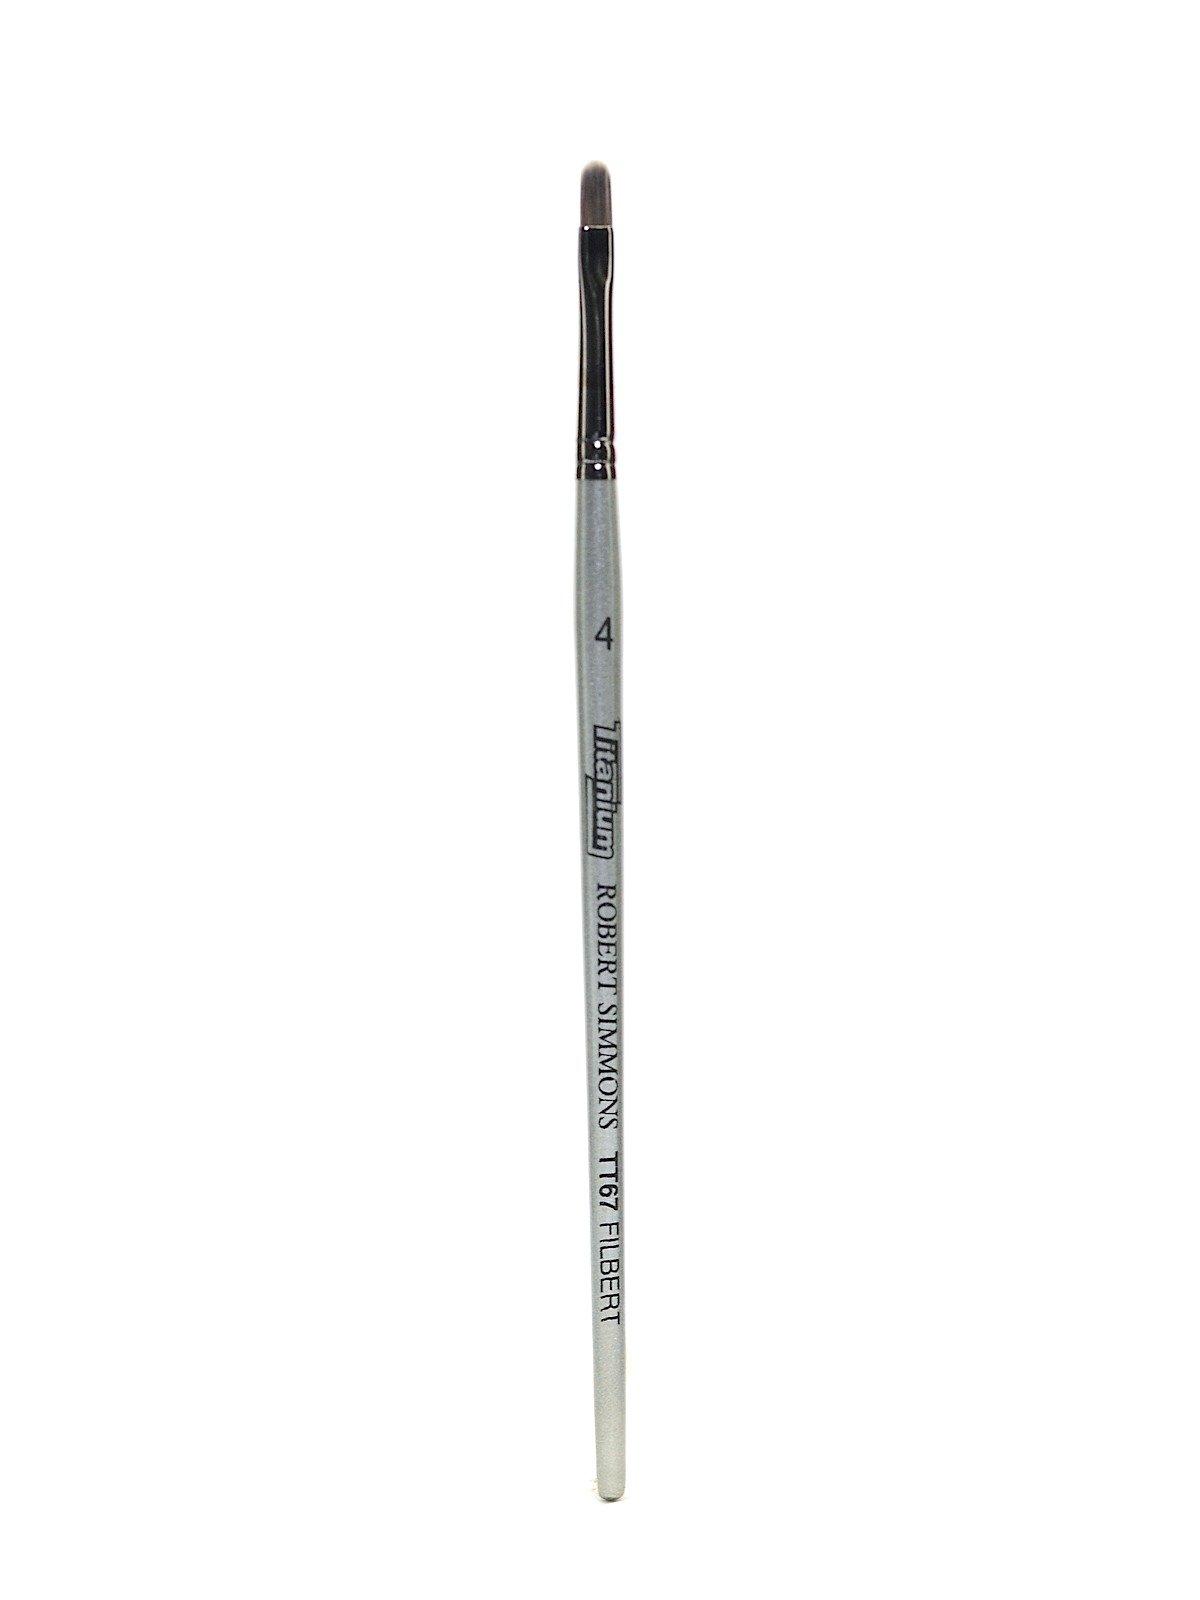 Robert Simmons Titanium Brushes Short Handle Single Stock 4 filbert TT67 [PACK OF 2 ]